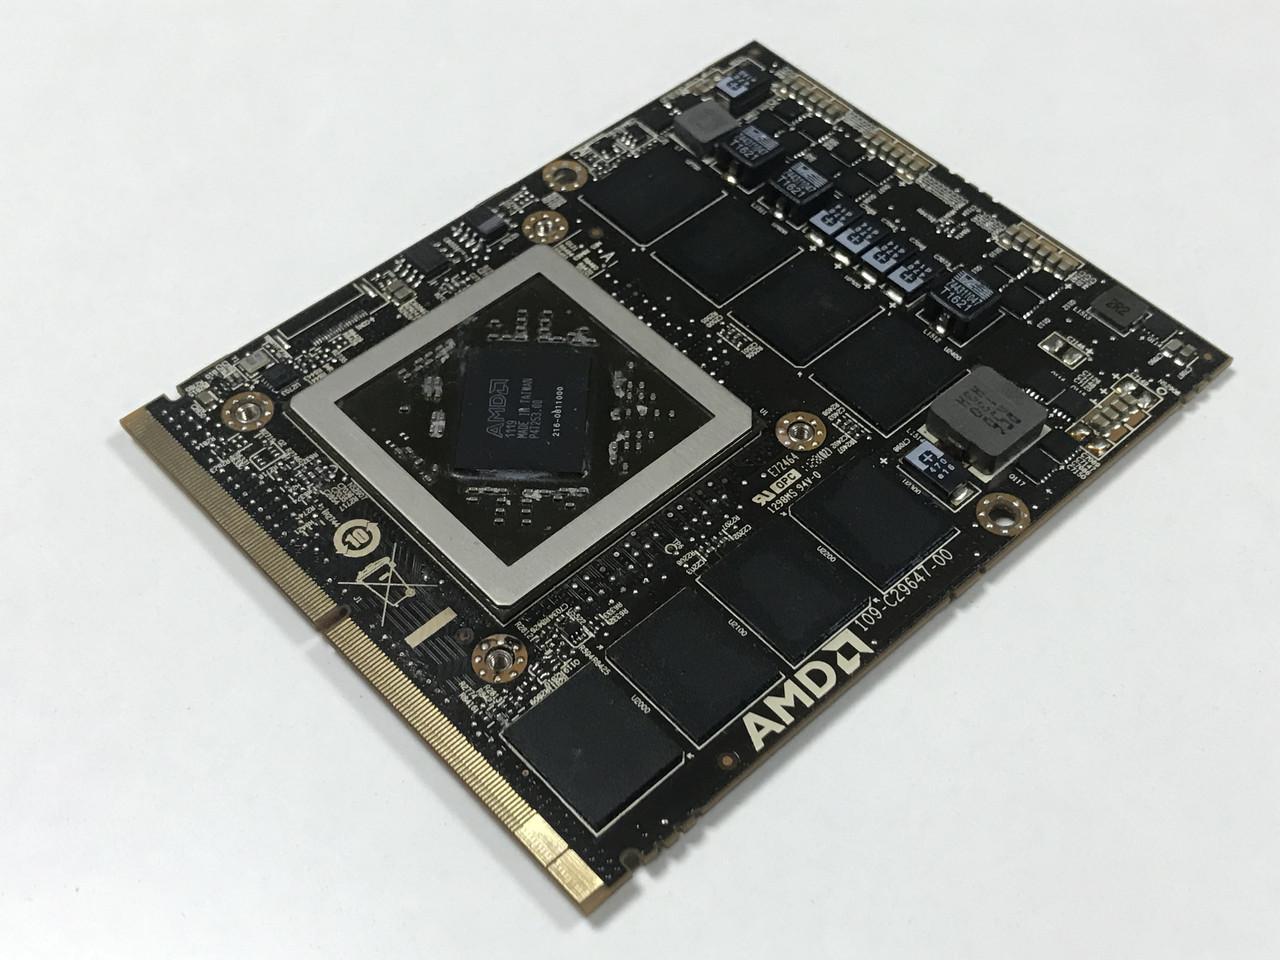 Видеокарта AMD ATI Firepro M8900 6W46K для ноутбука Dell Precission M6600 (ПОД ВОССТАНОВЛЕНИЕ)